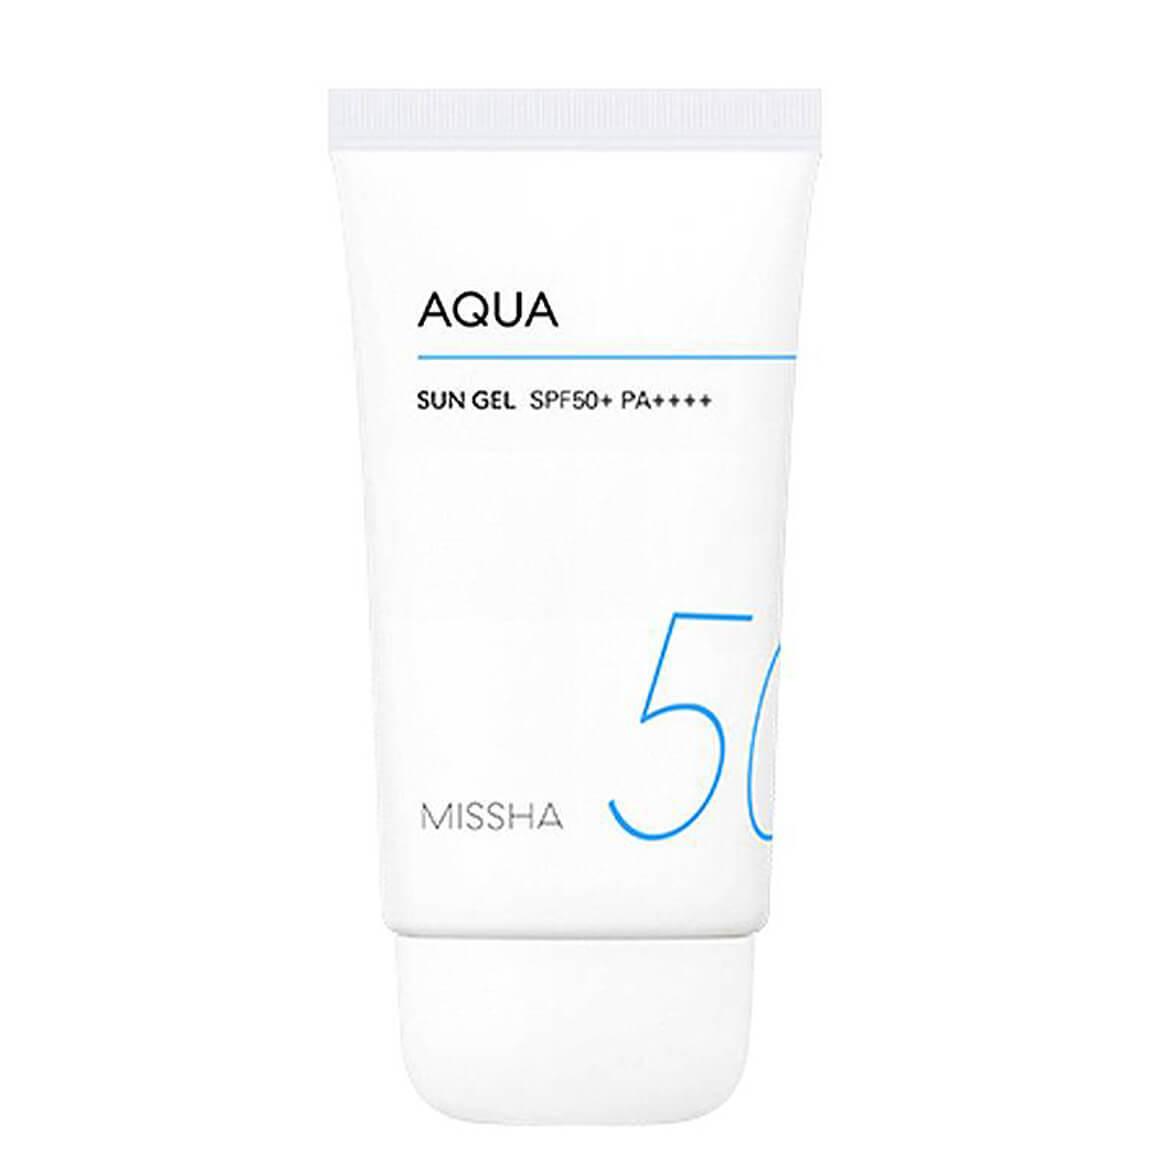 Missha All Around Safe Sun Block Aqua Gel SPF50+ 50ml